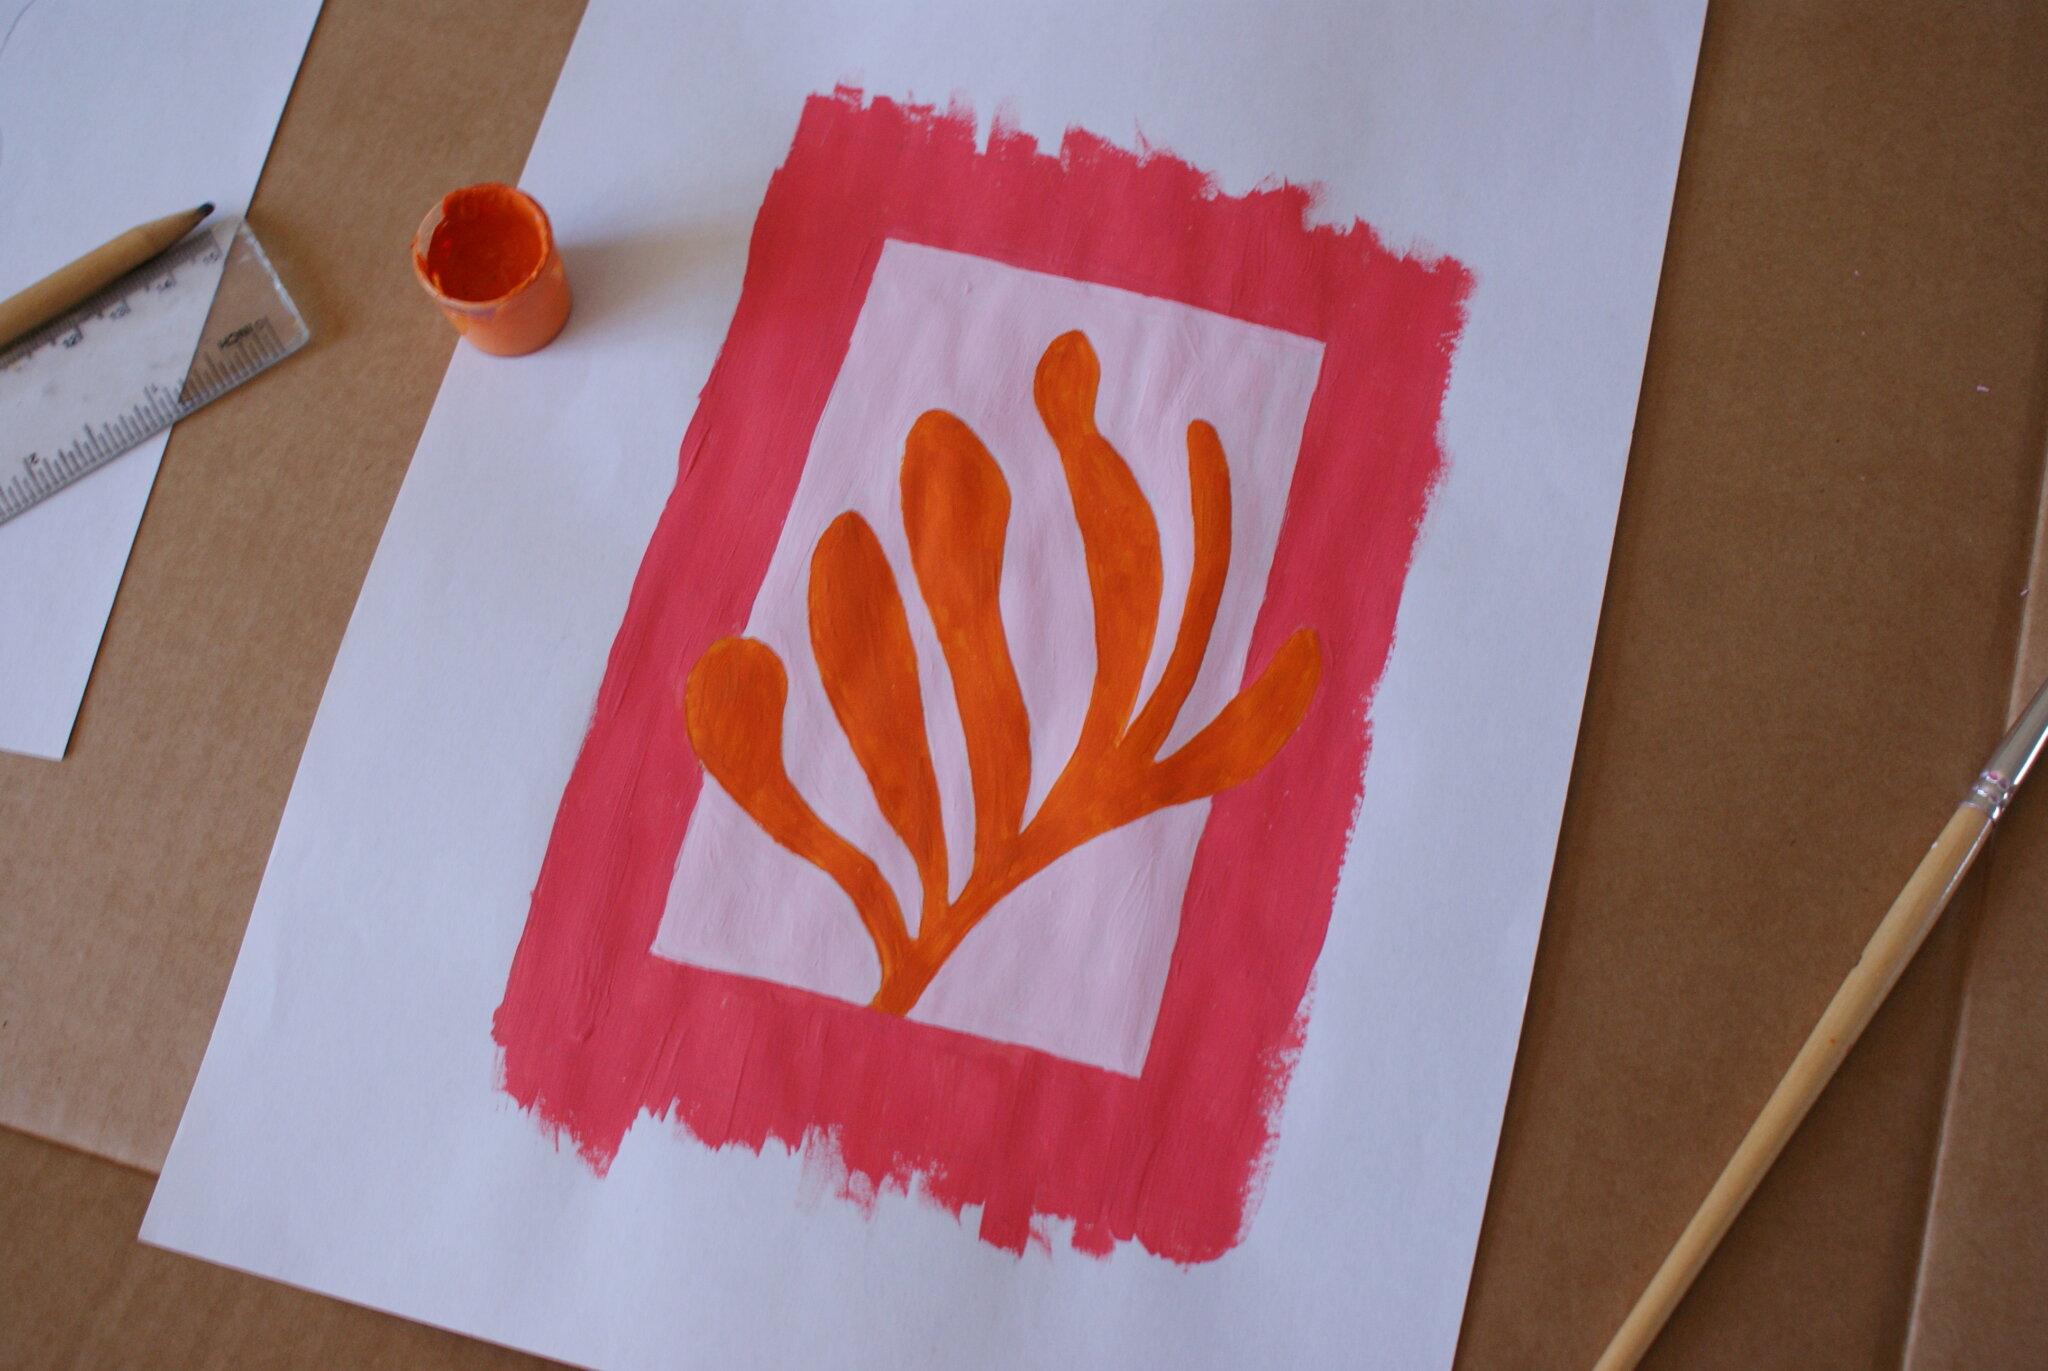 dipinto henri matisse fai da te replicare fare casa floreale piante minimal